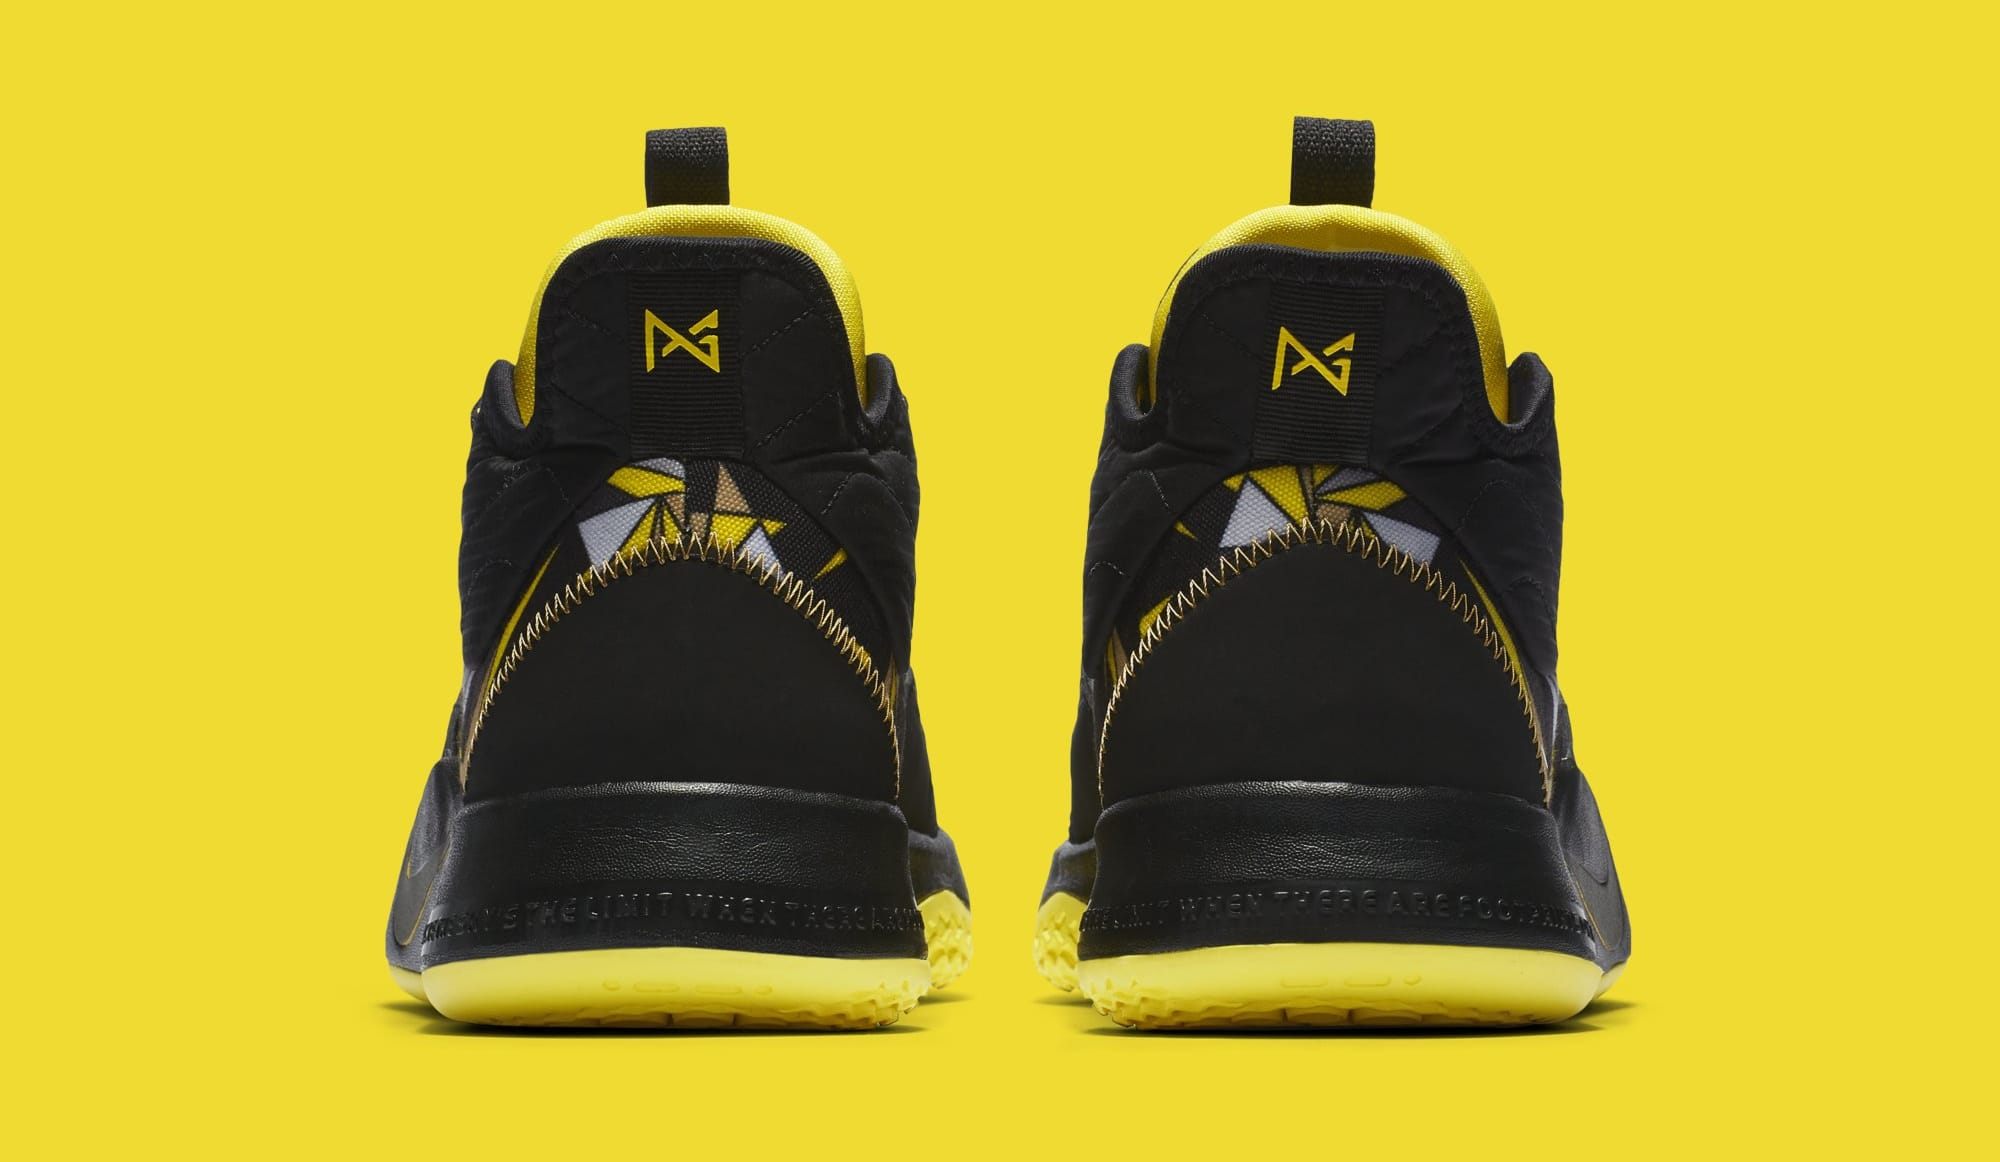 finest selection c2916 2ba2d Image via Nike Nike PG 3  Mamba Mentality  AO2608-900 (Heel)